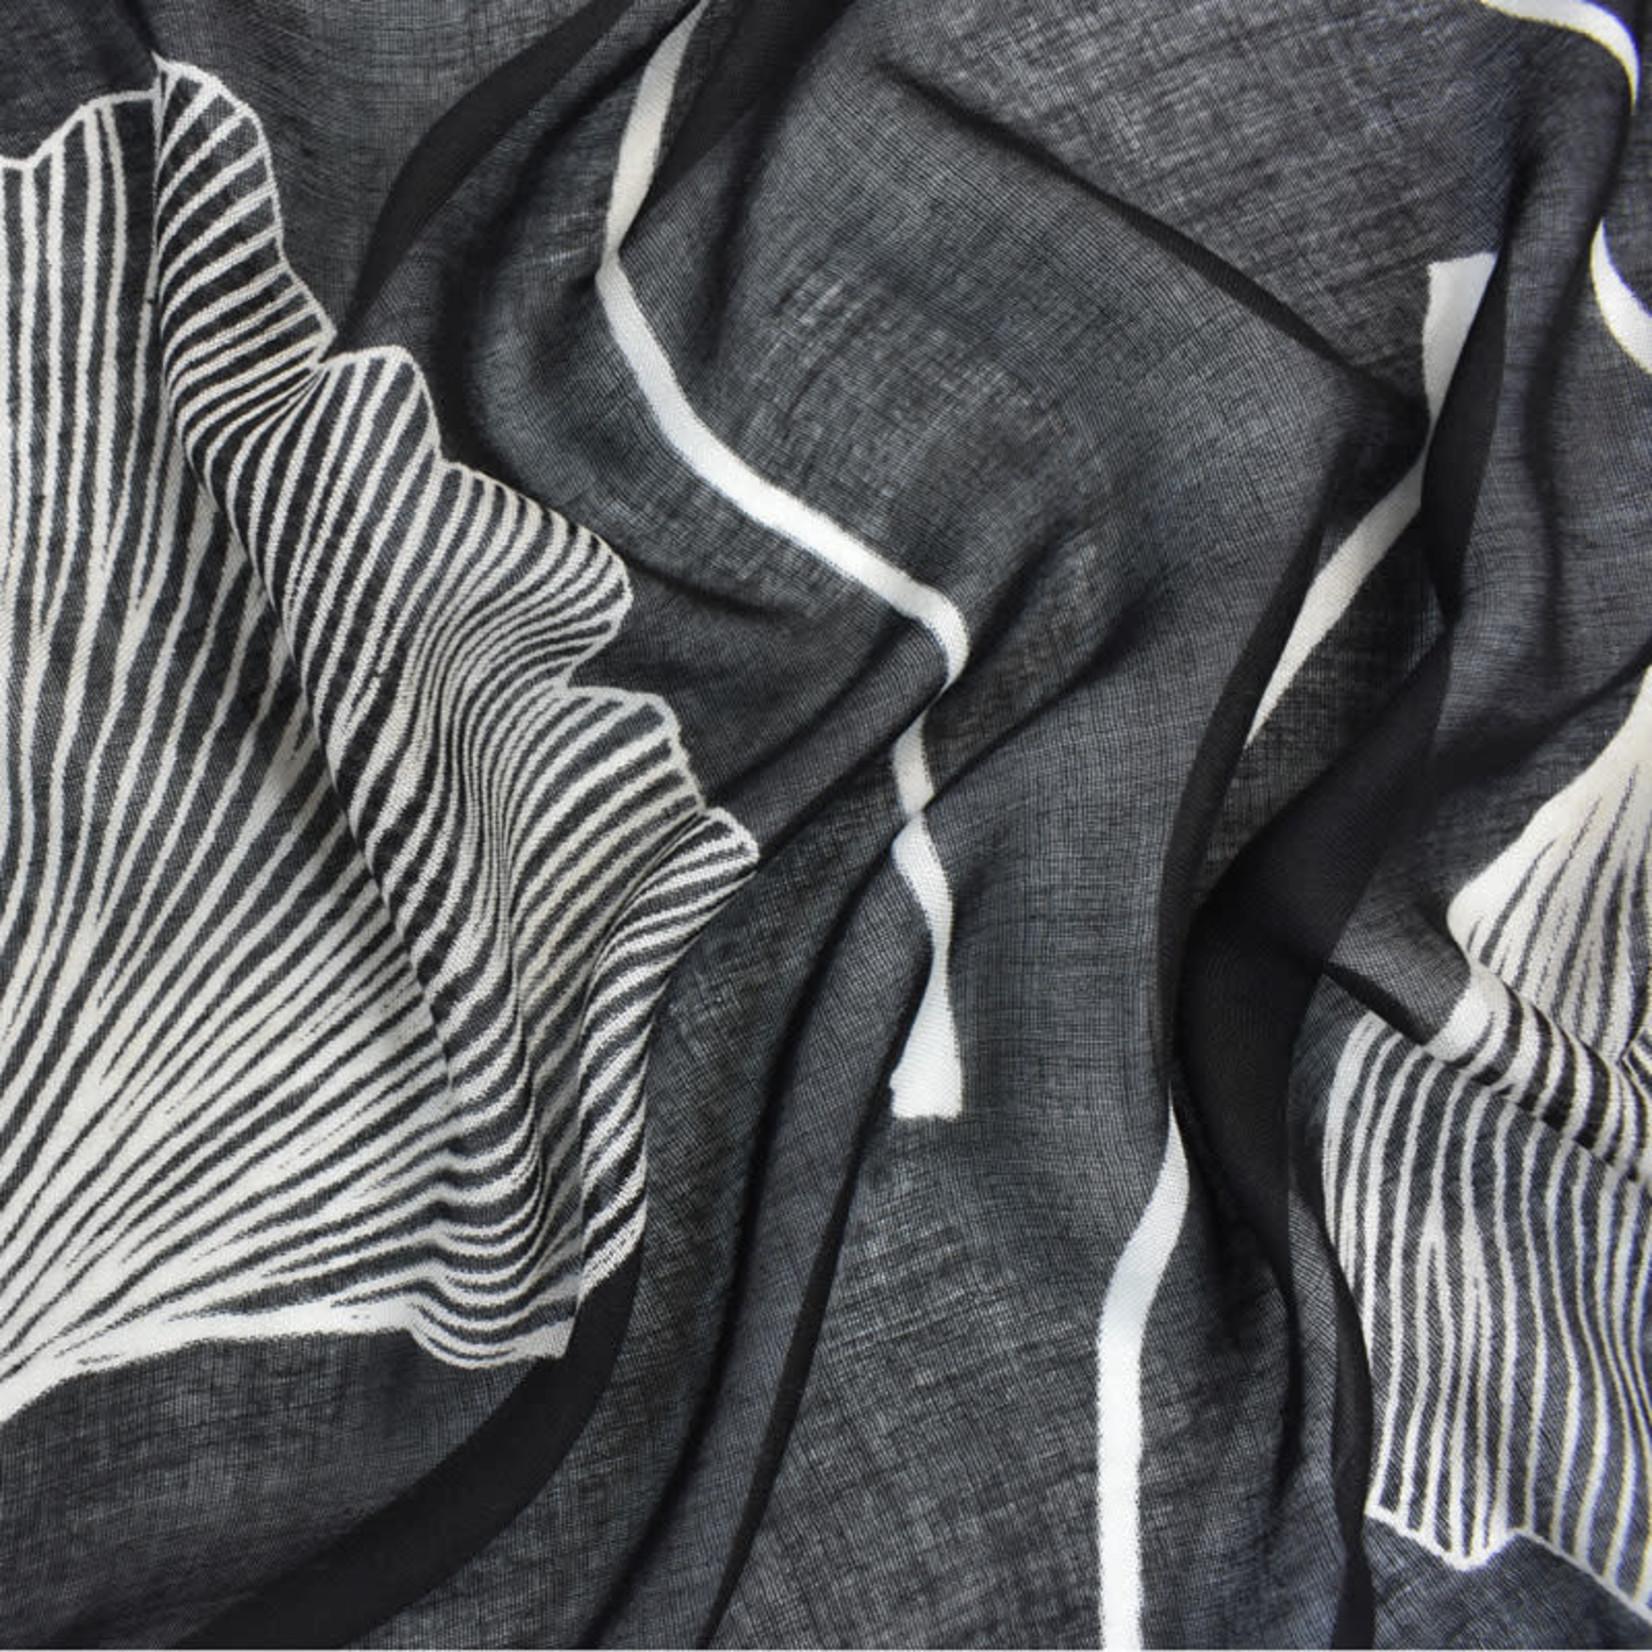 Ginko Leaves White On Black 100% Viscose Scarf